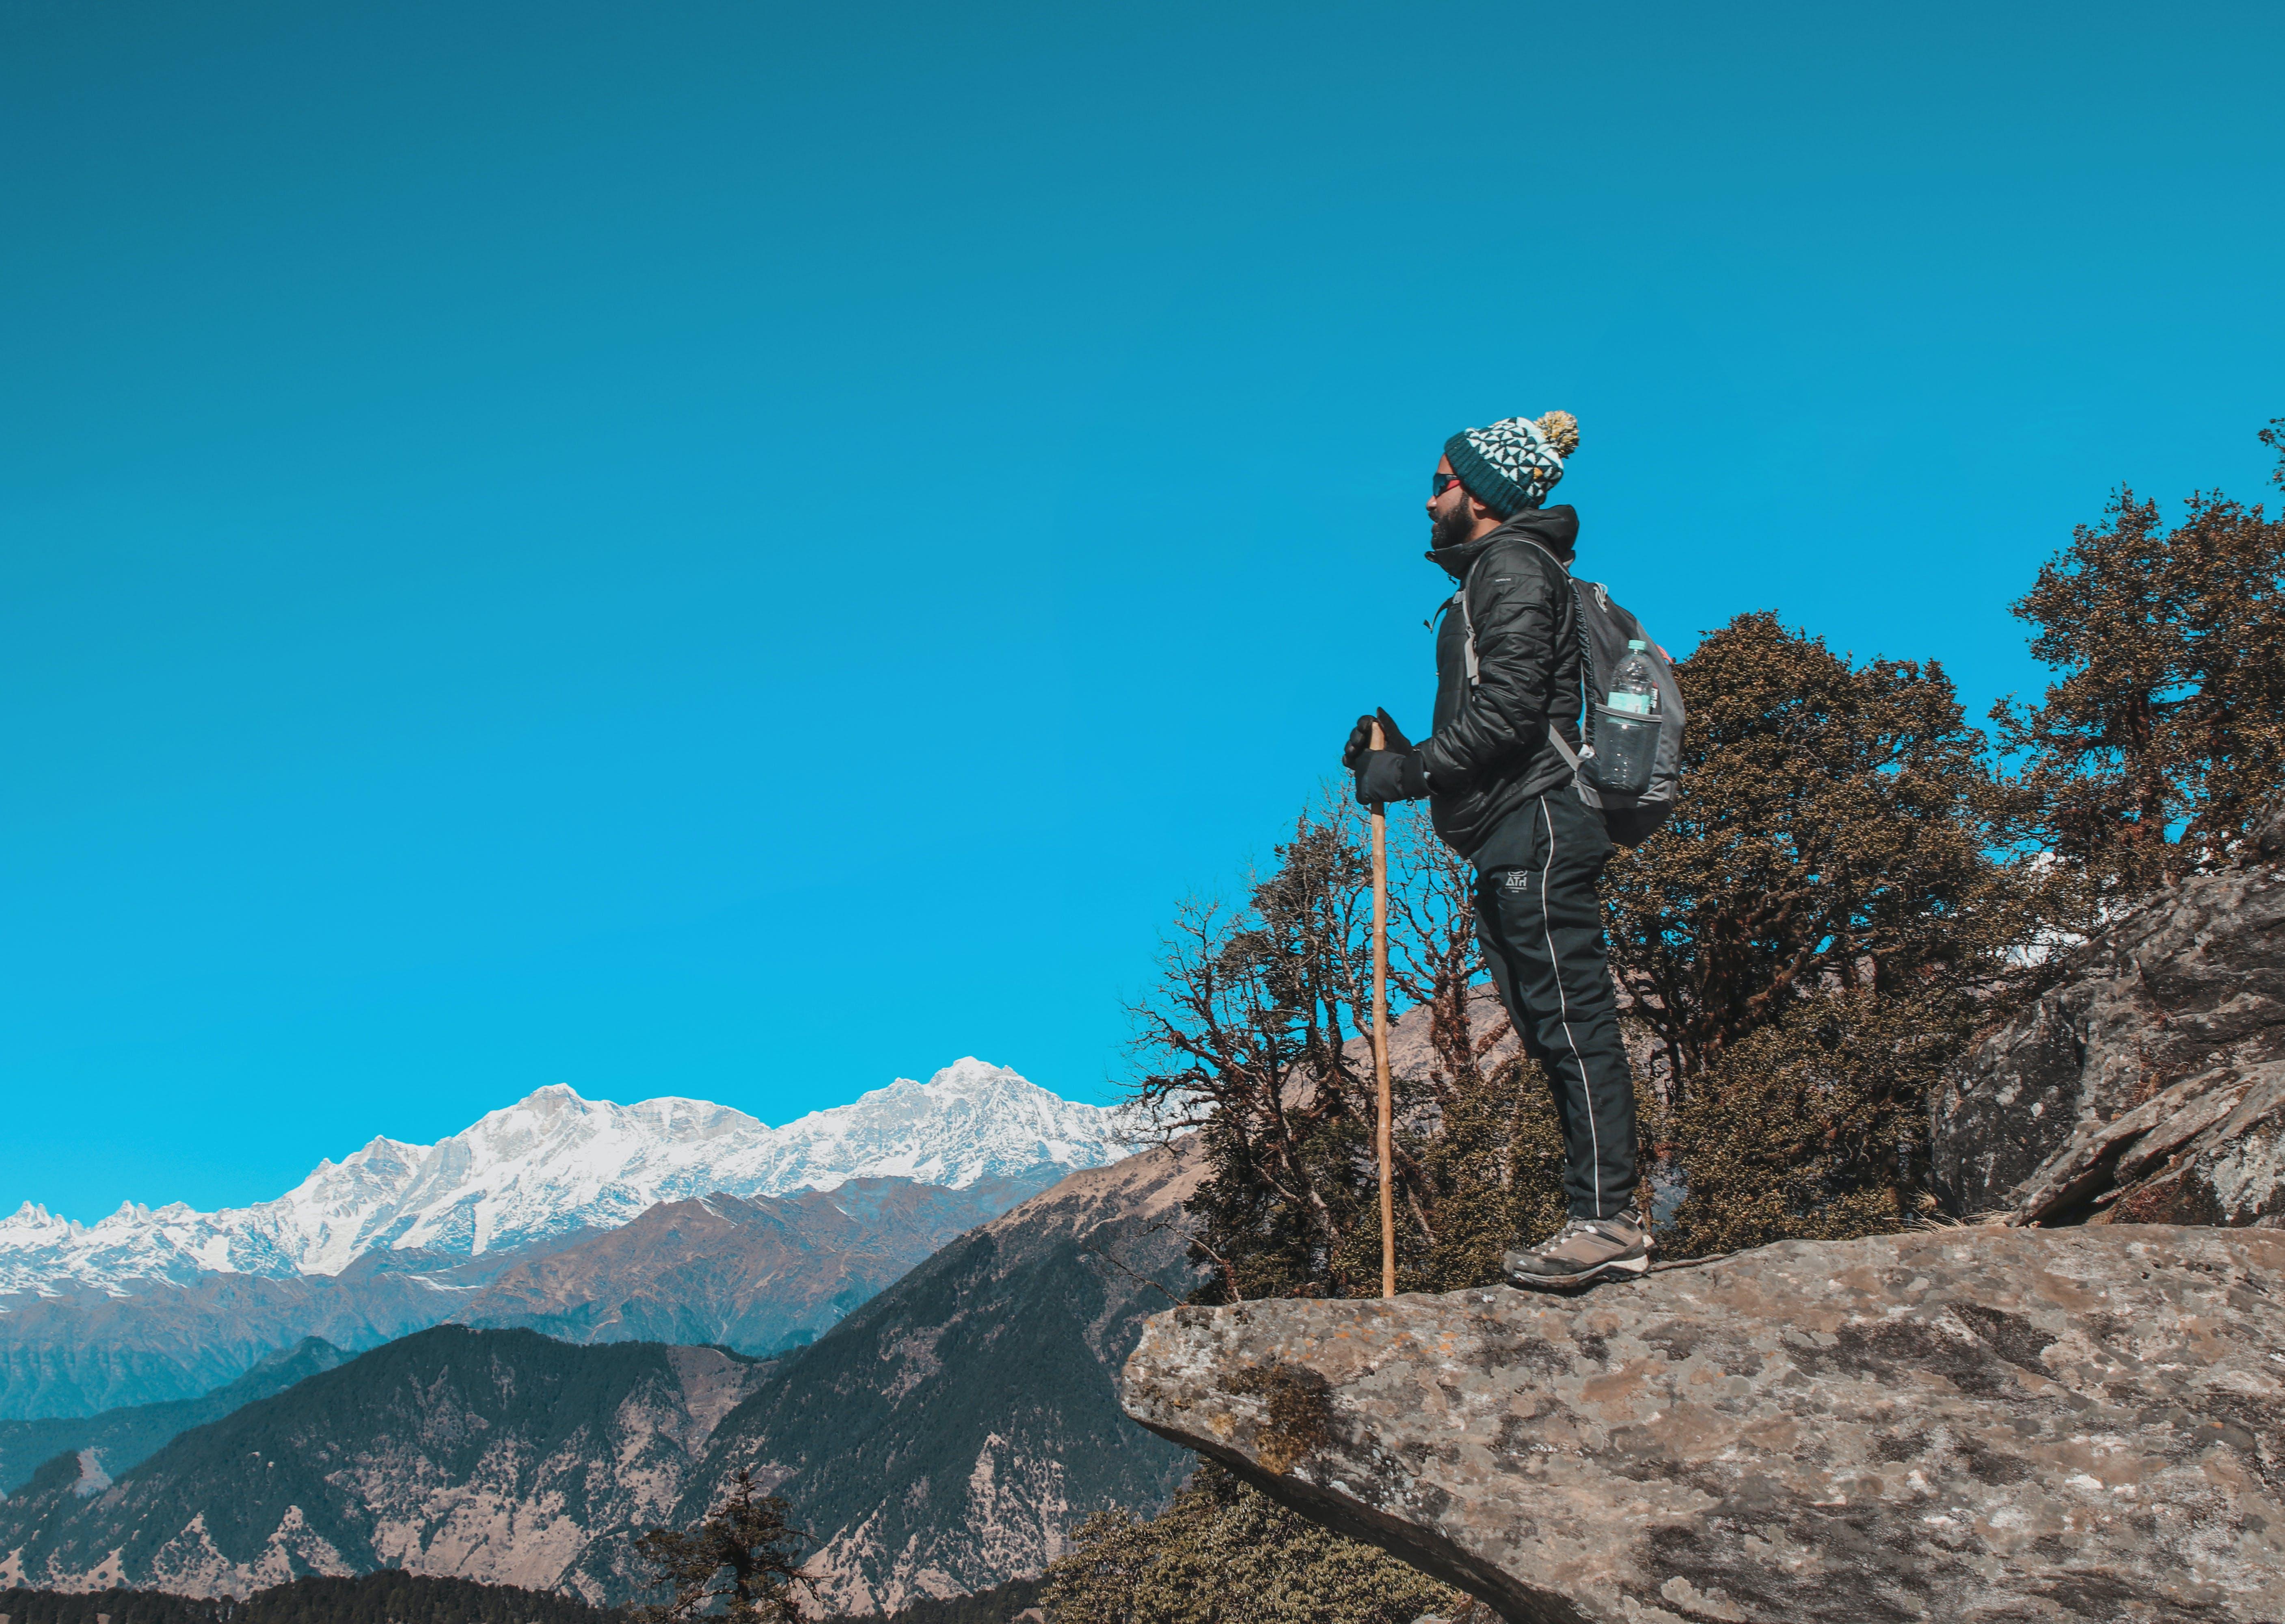 Man Wearing Black Jacket Near Mountain